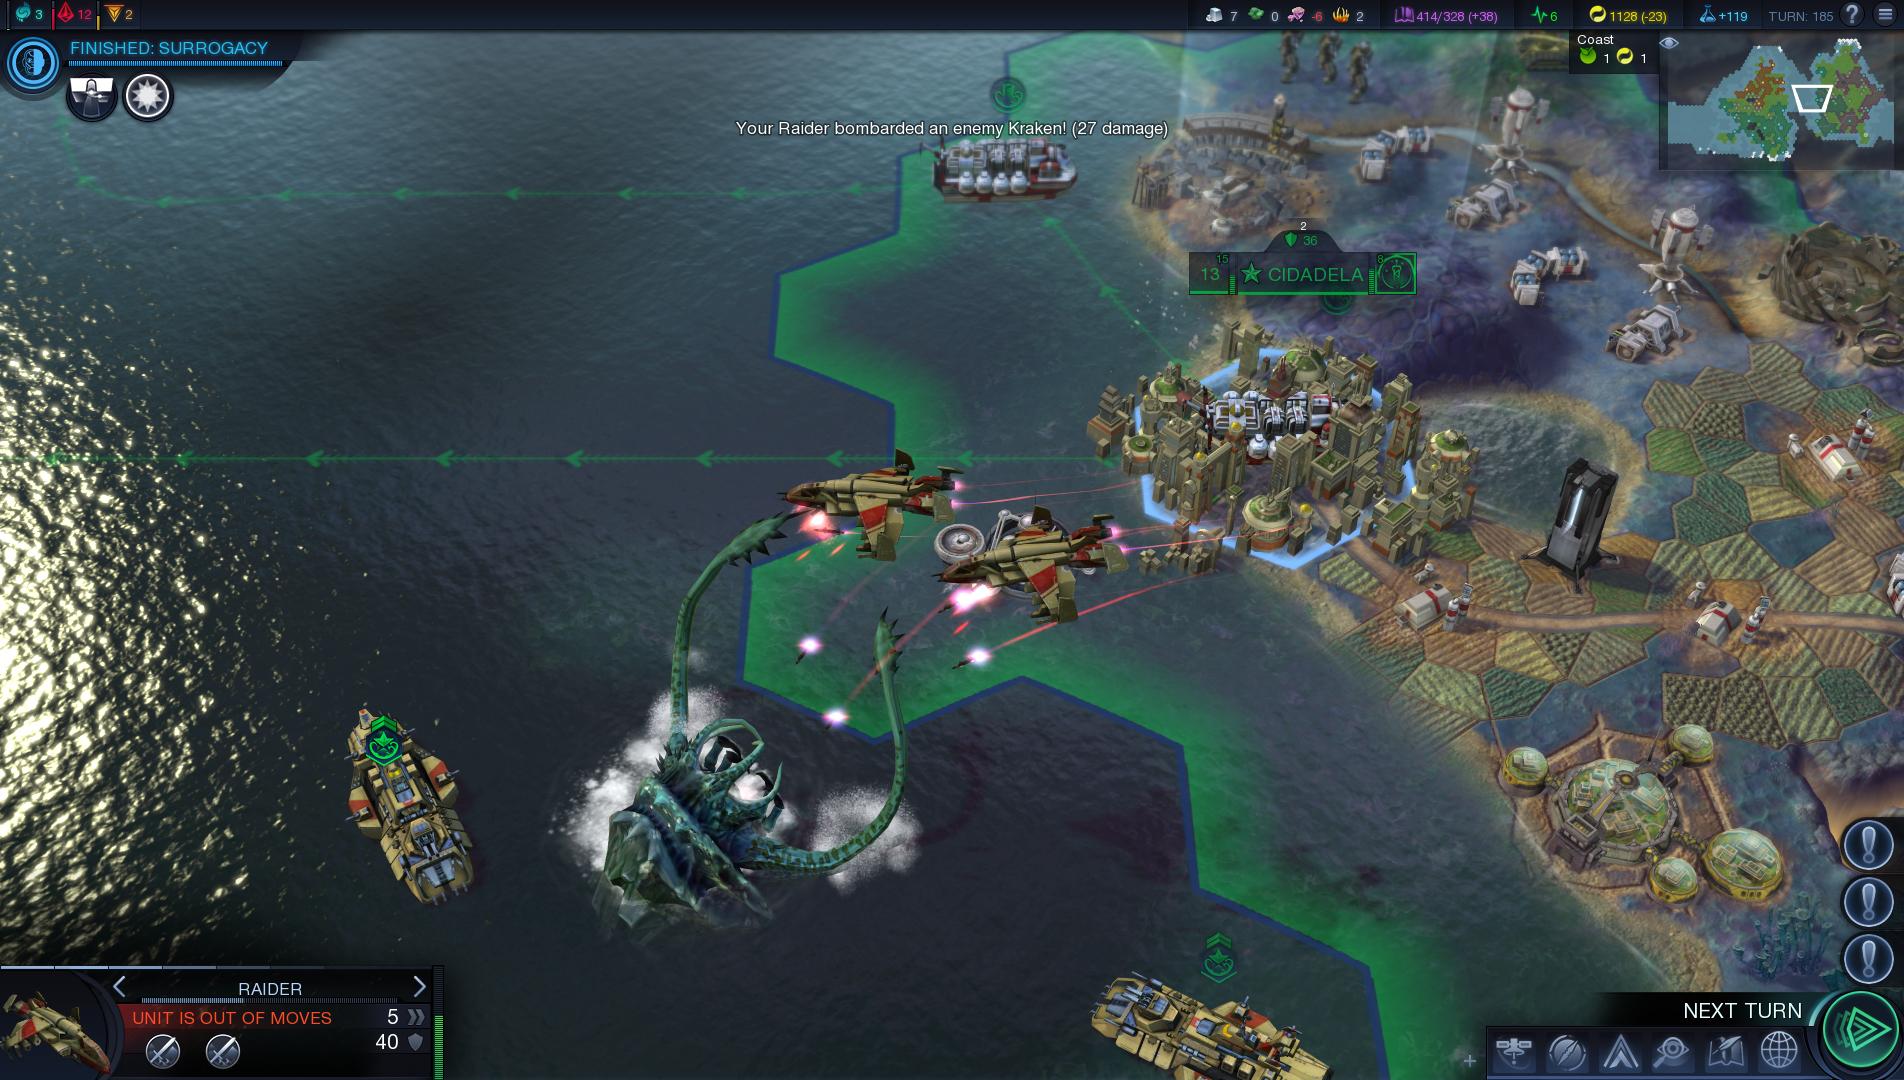 Sid Meier's Civilization: Beyond Earth is free on Steam this weekend